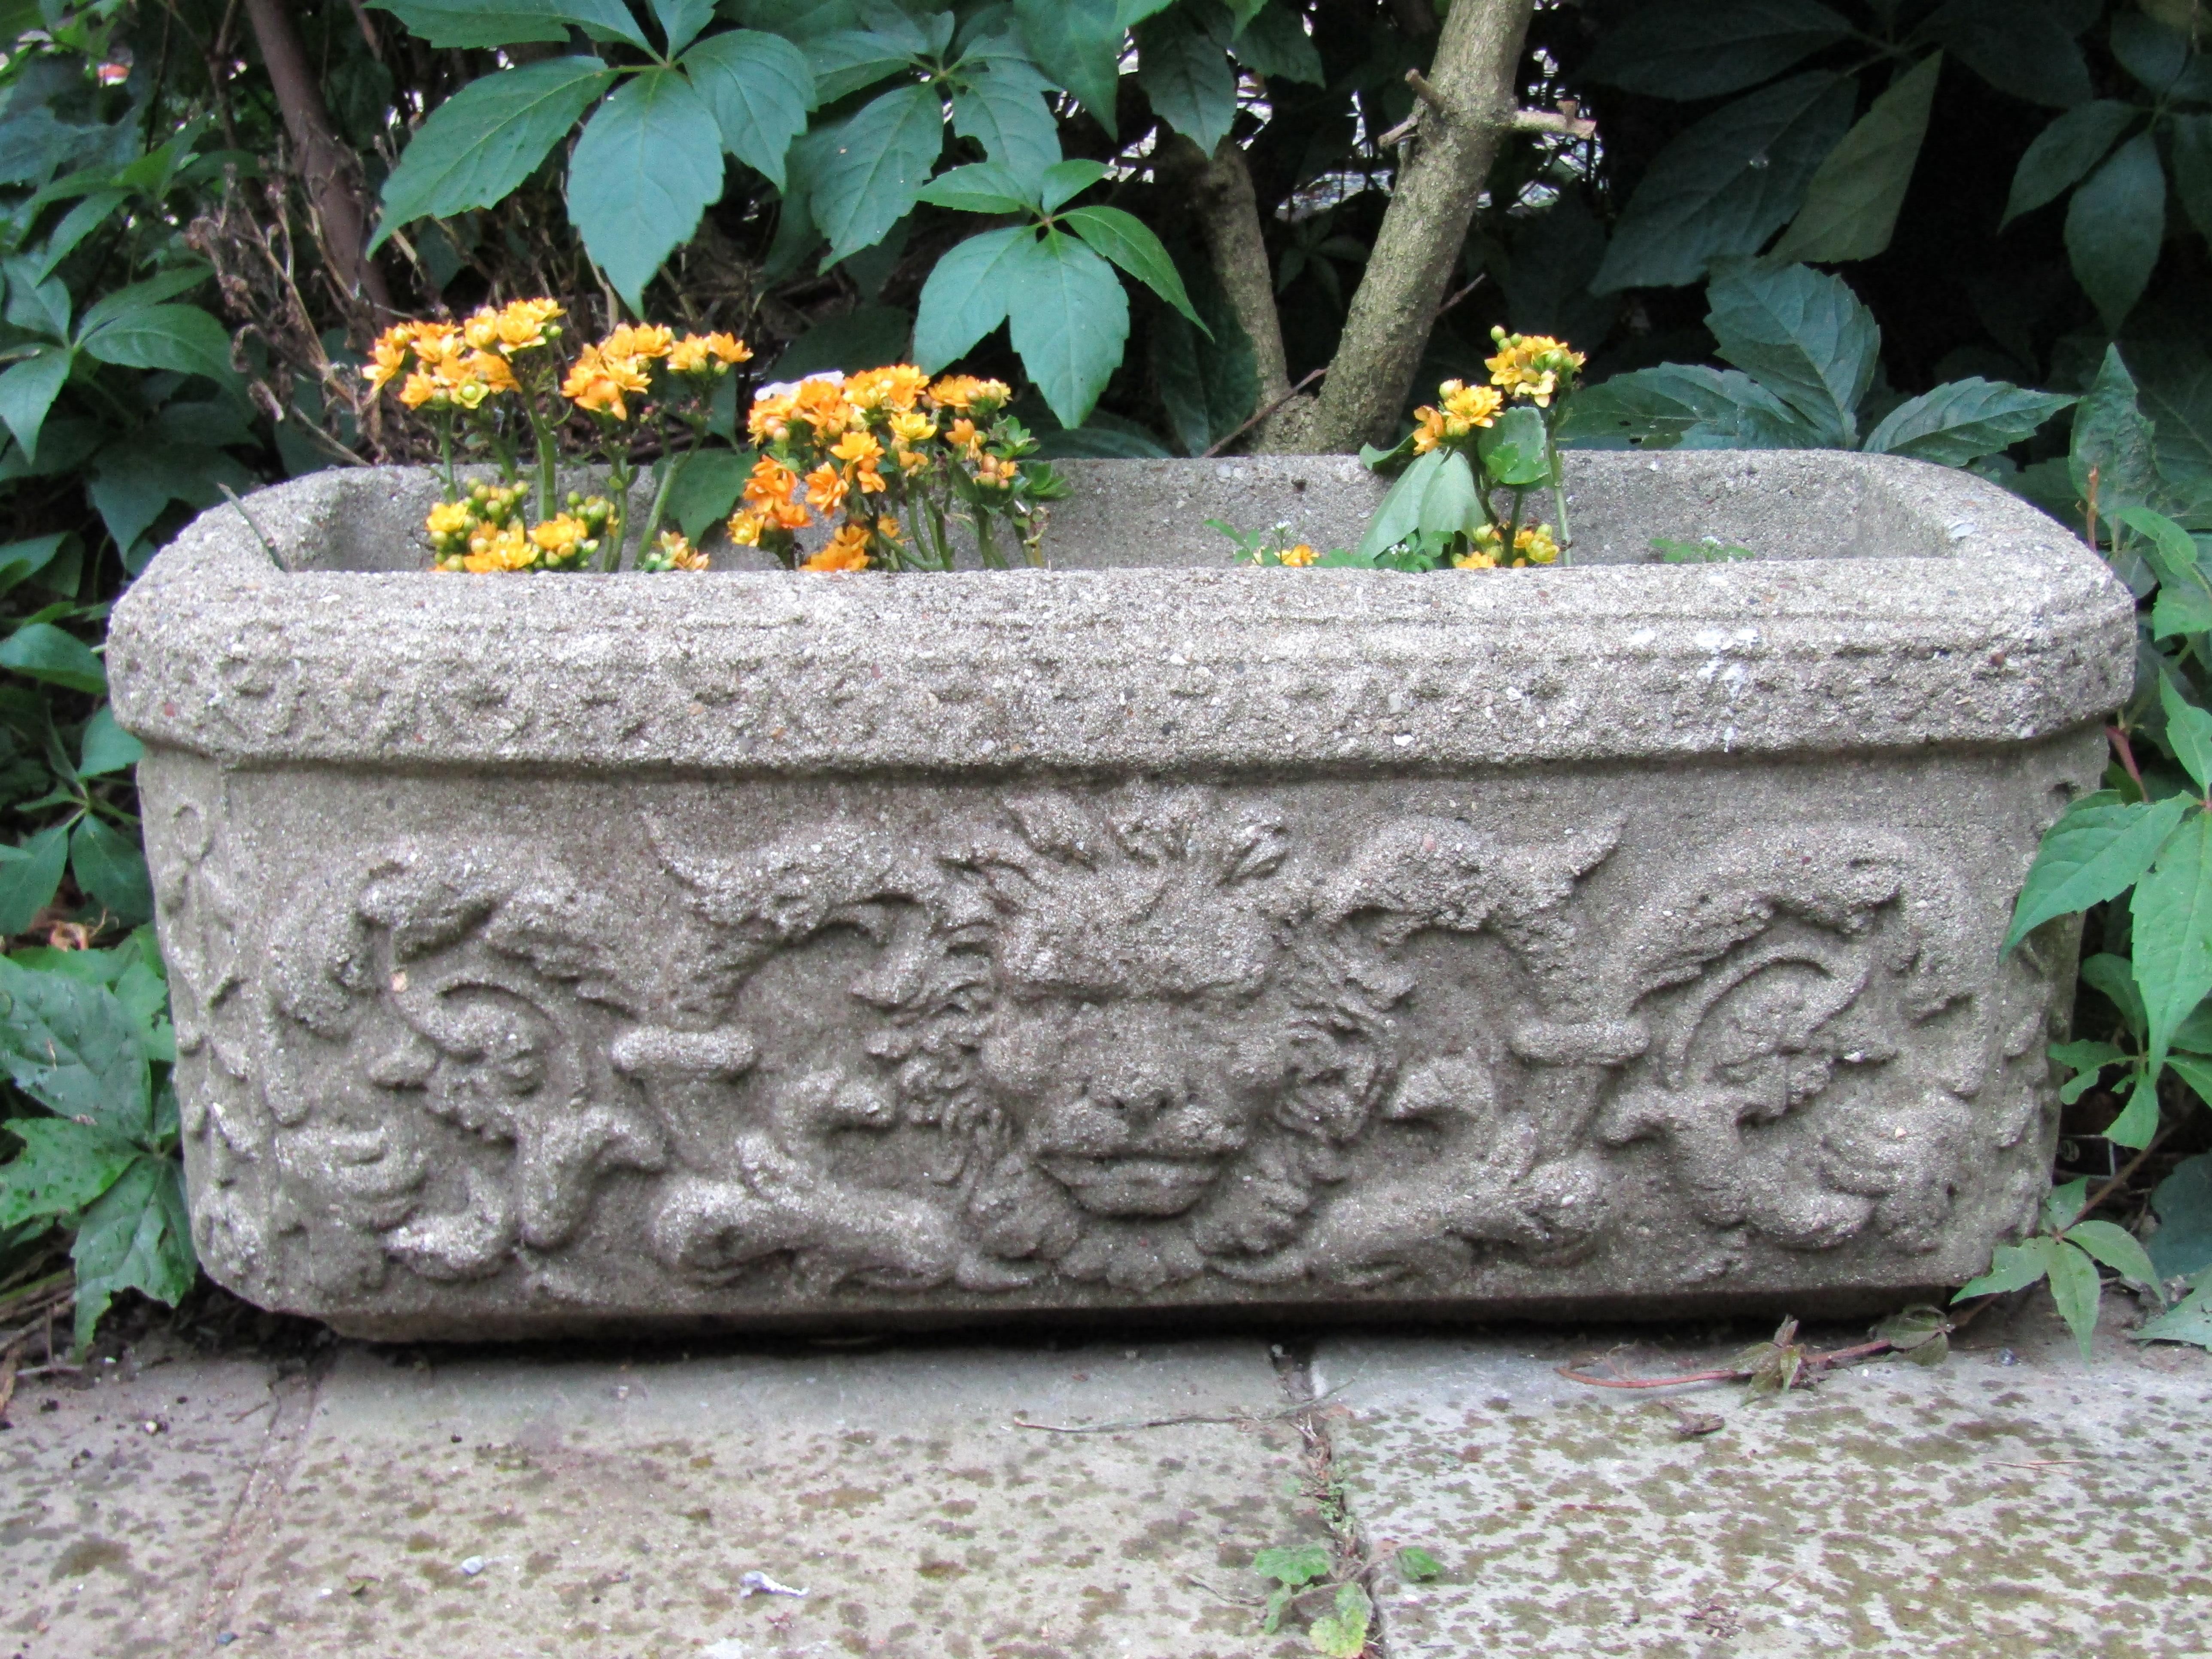 Ordinaire Set Of 11 Cast Reconstituted Stone Garden Planters Troughs 1900s Garden  Feature